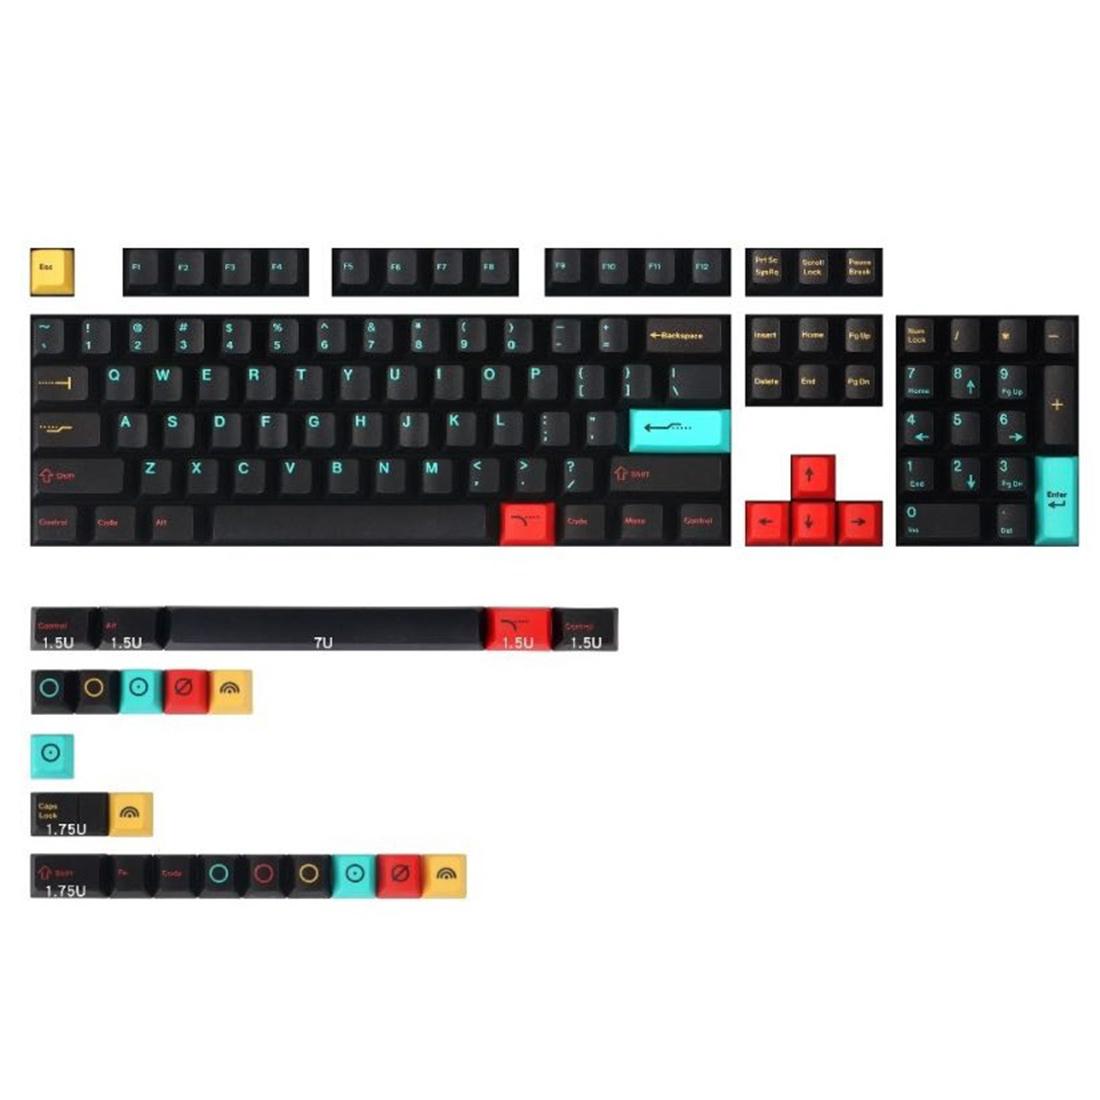 129pcs Metropolis Keycaps Set PBT Dye-sub with Puller for 61/64/87/96/104 Keys GH60 RK61 Matrix Joke Custom Mechanical Gaming Keyboard